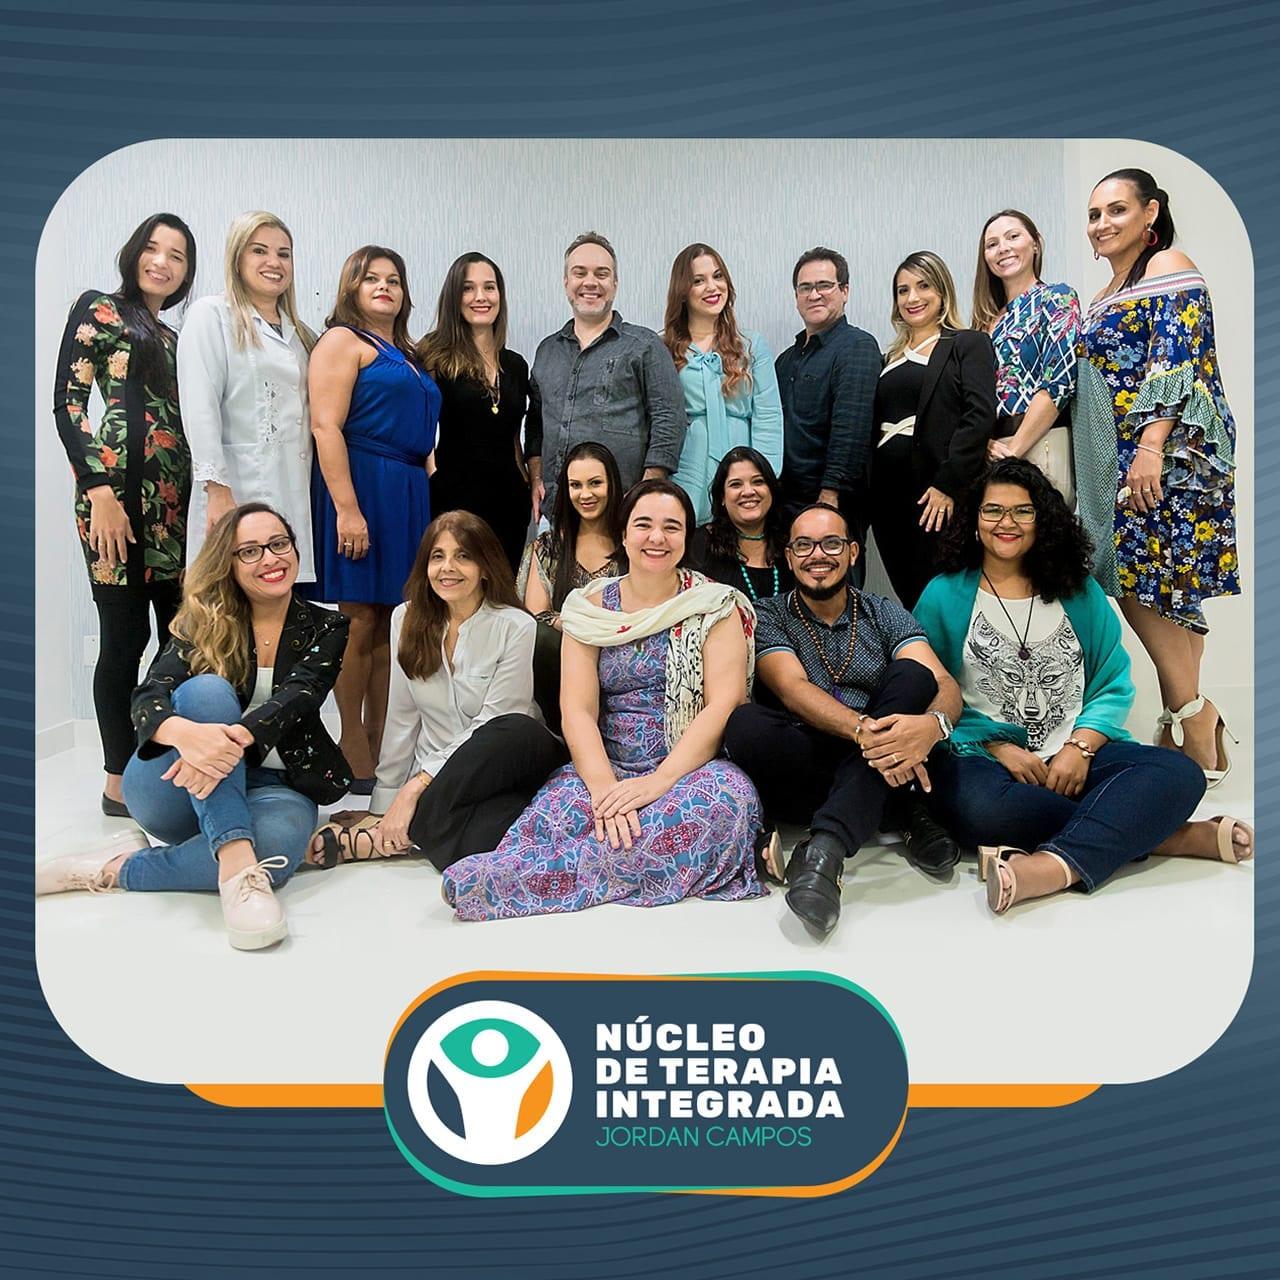 Equipe do Núcleo de Terapia Integrada – Jordan Campos